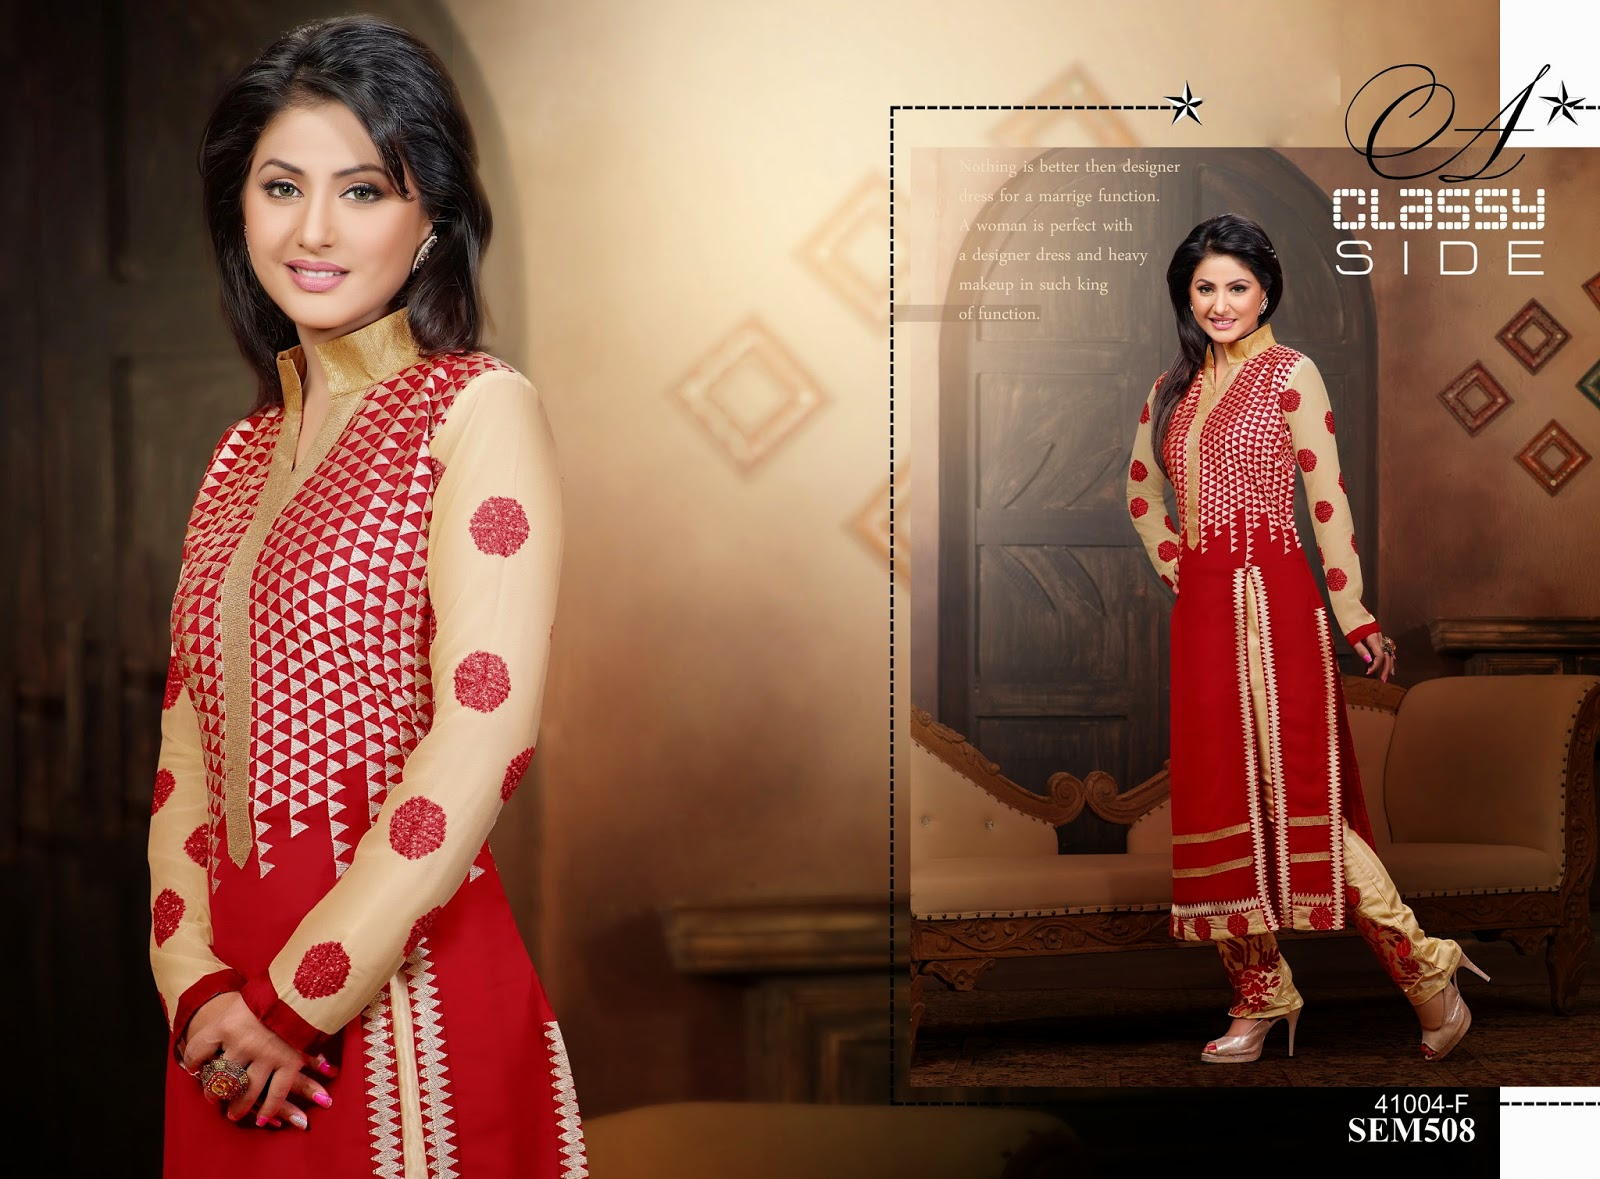 Mumtaz khan fashion designer 21